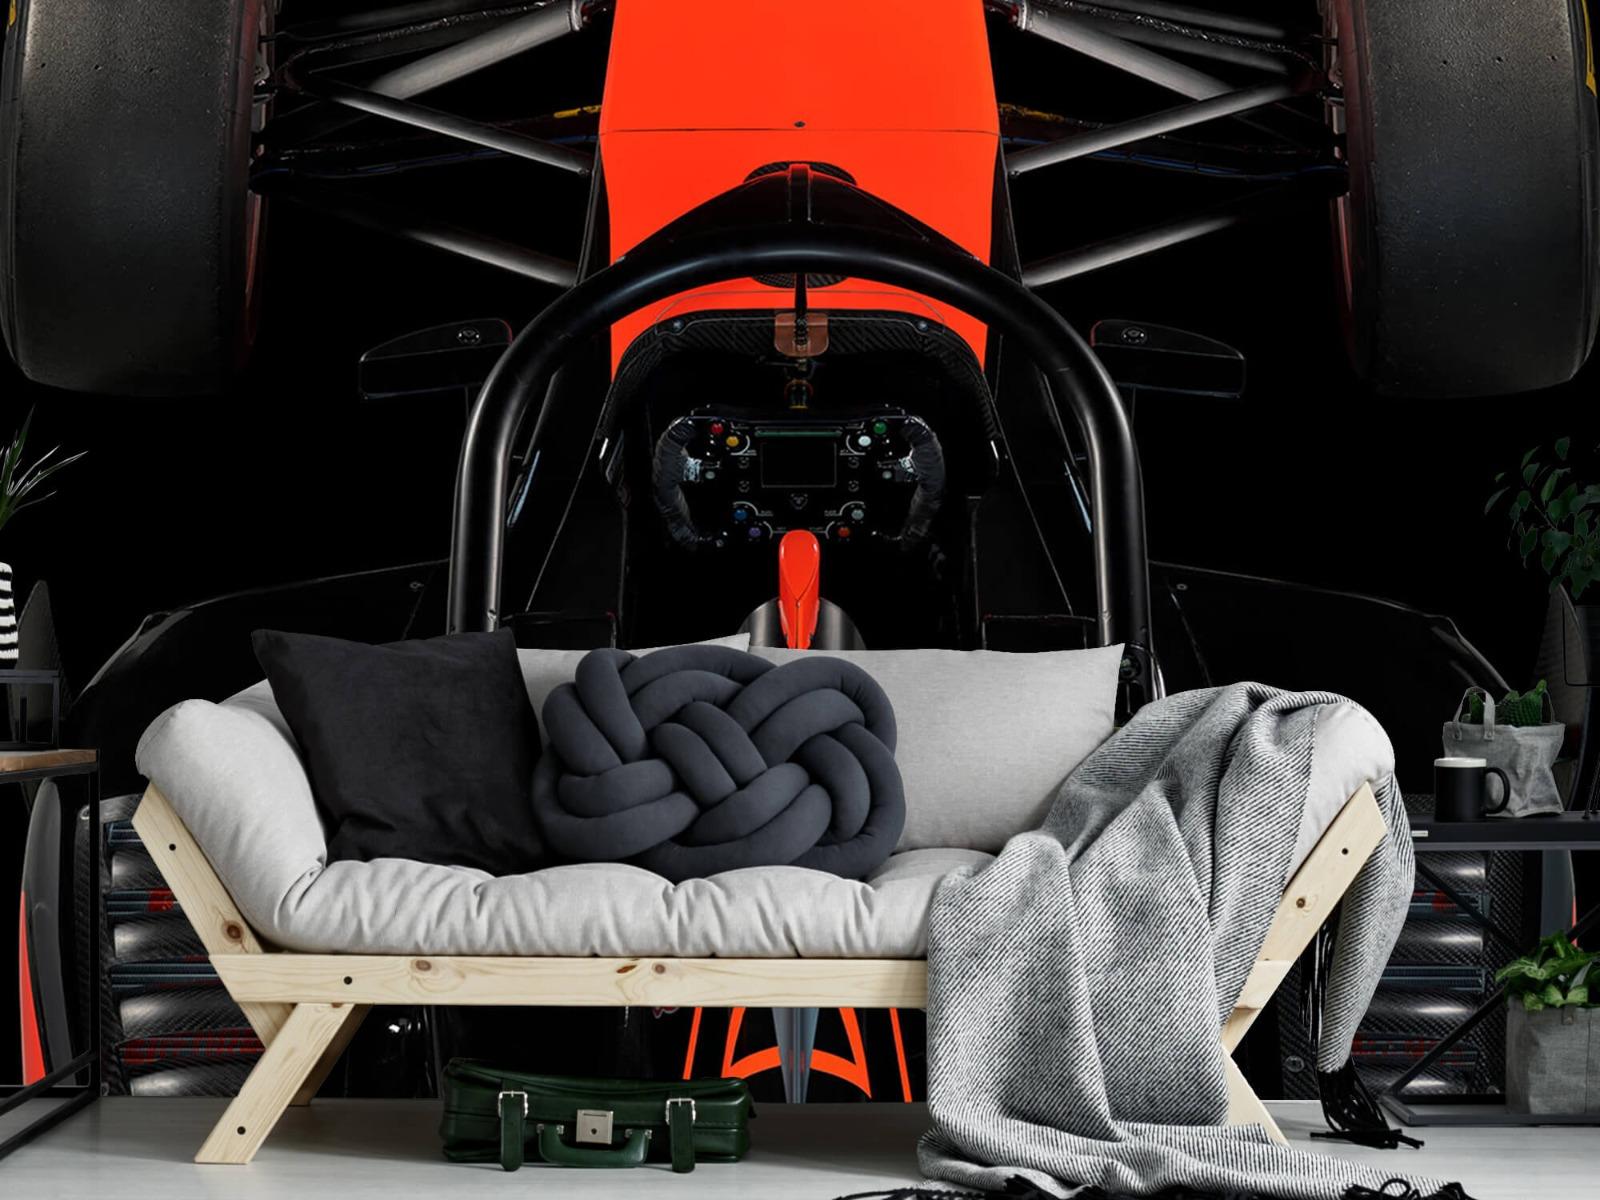 Sportauto's - Formule 3 - Cockpit view - dark - Tienerkamer 6